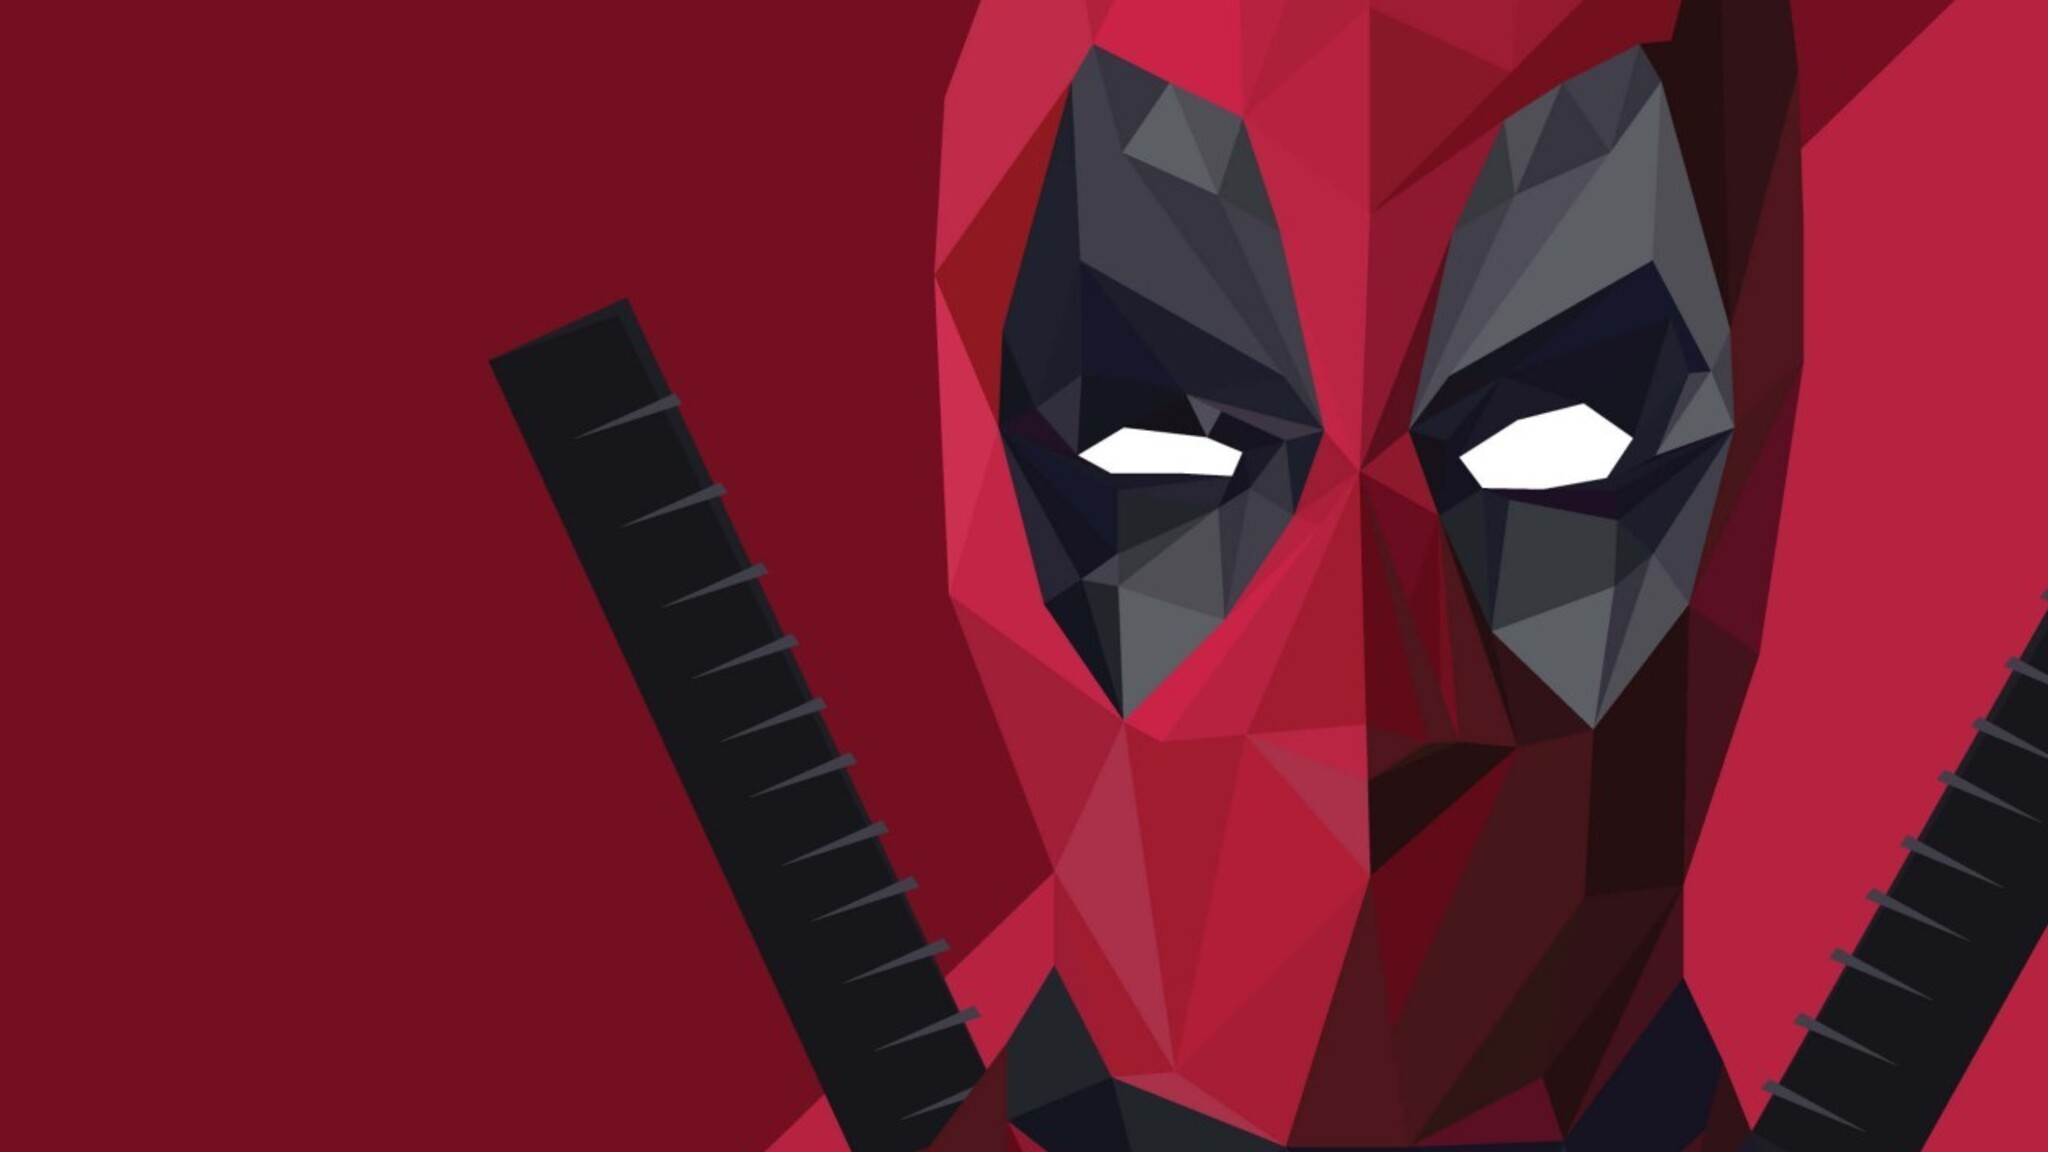 2048x1152 deadpool abstract art 2048x1152 resolution hd 4k - Deadpool download 1080p ...